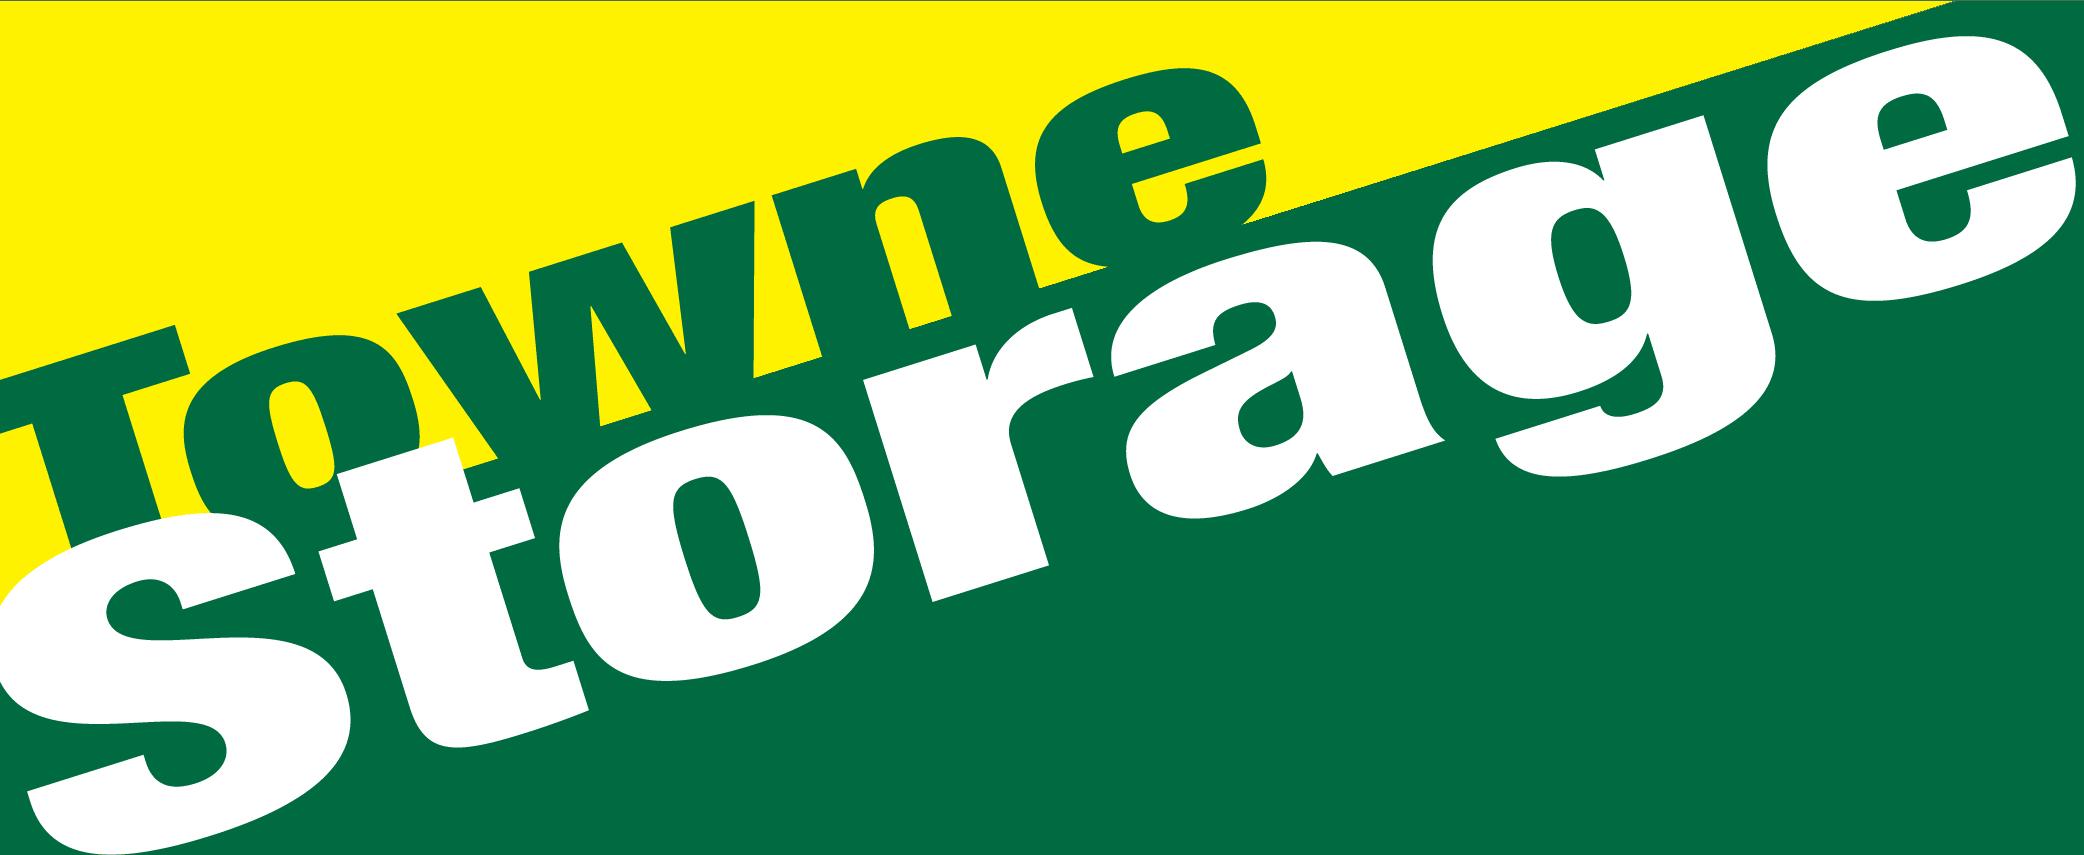 Towne Storage - Riverton 2 logo